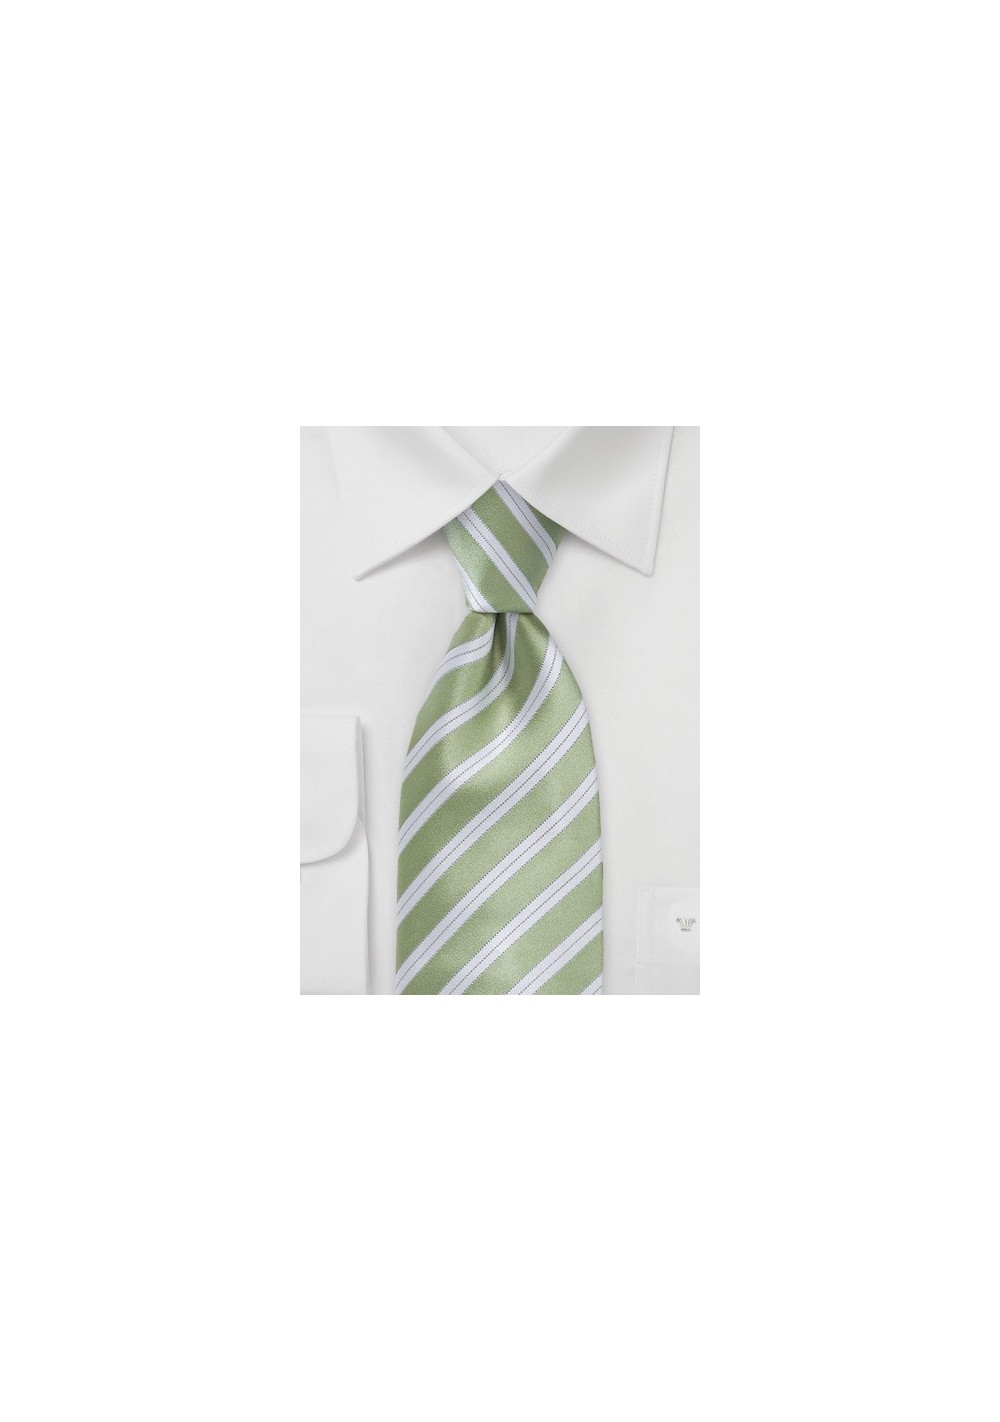 Striped Tie in Clover Green